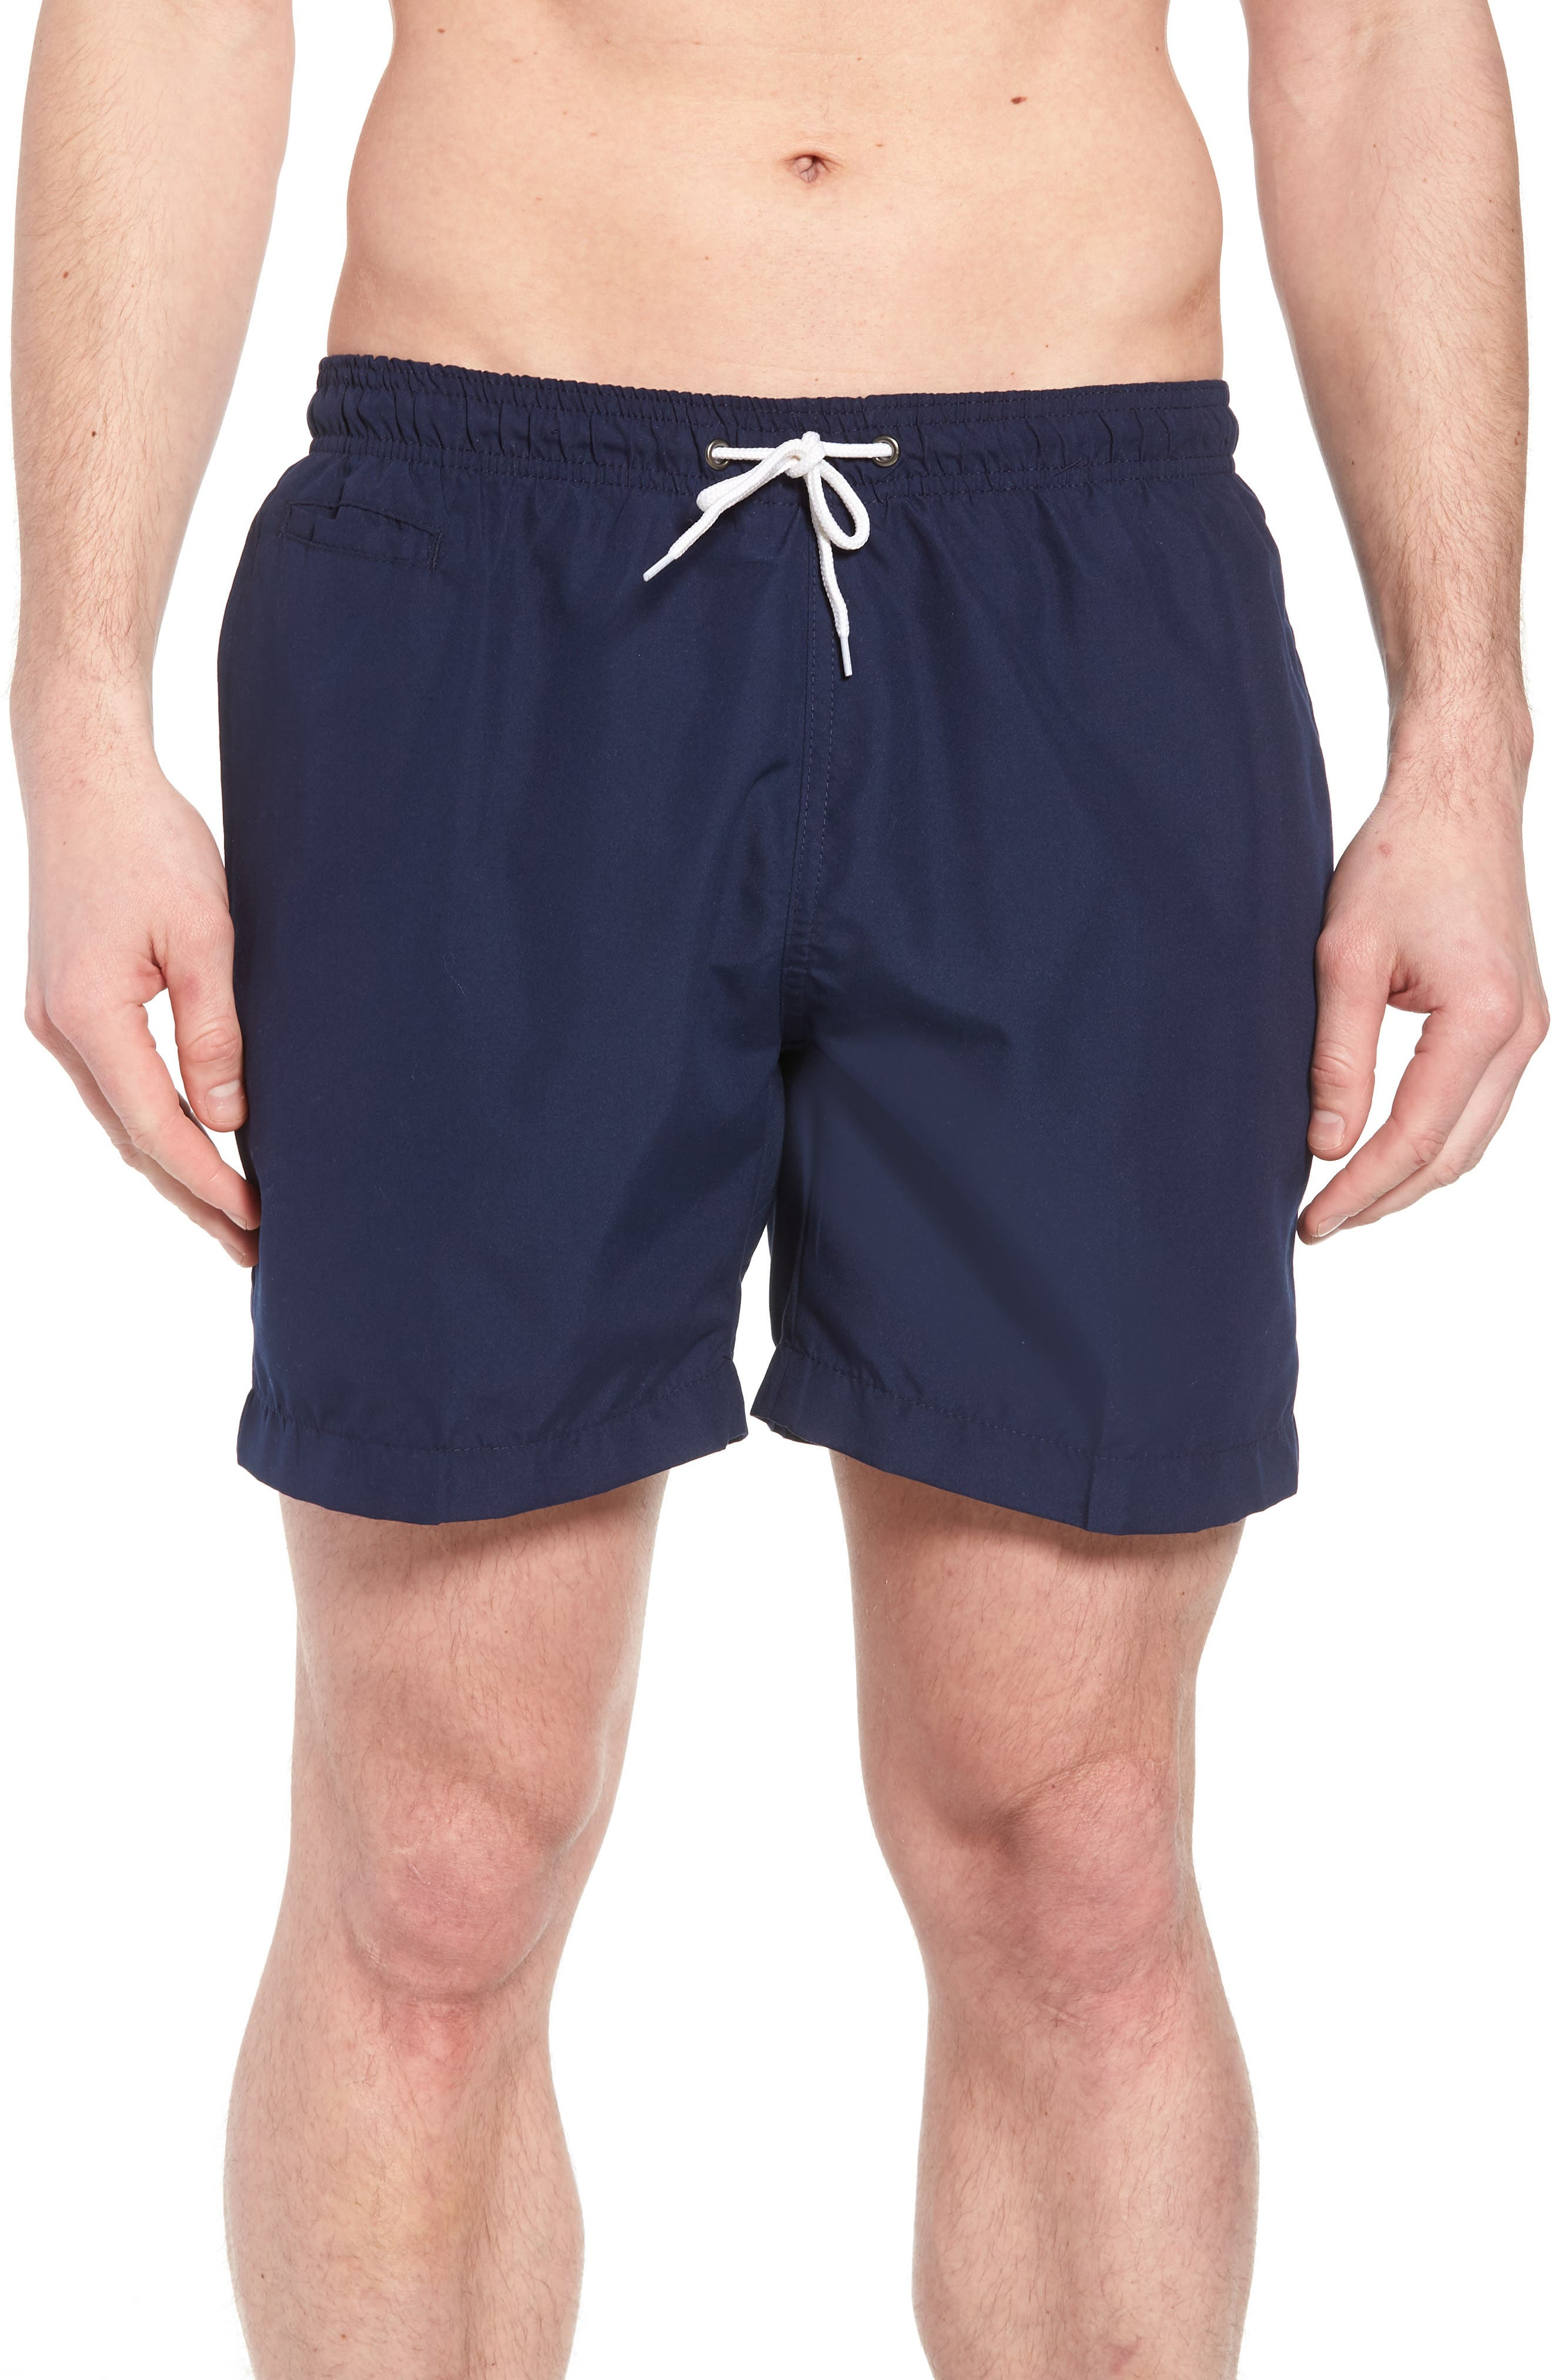 Trunks Surf & Swim 'San O' Volley Swim Shorts